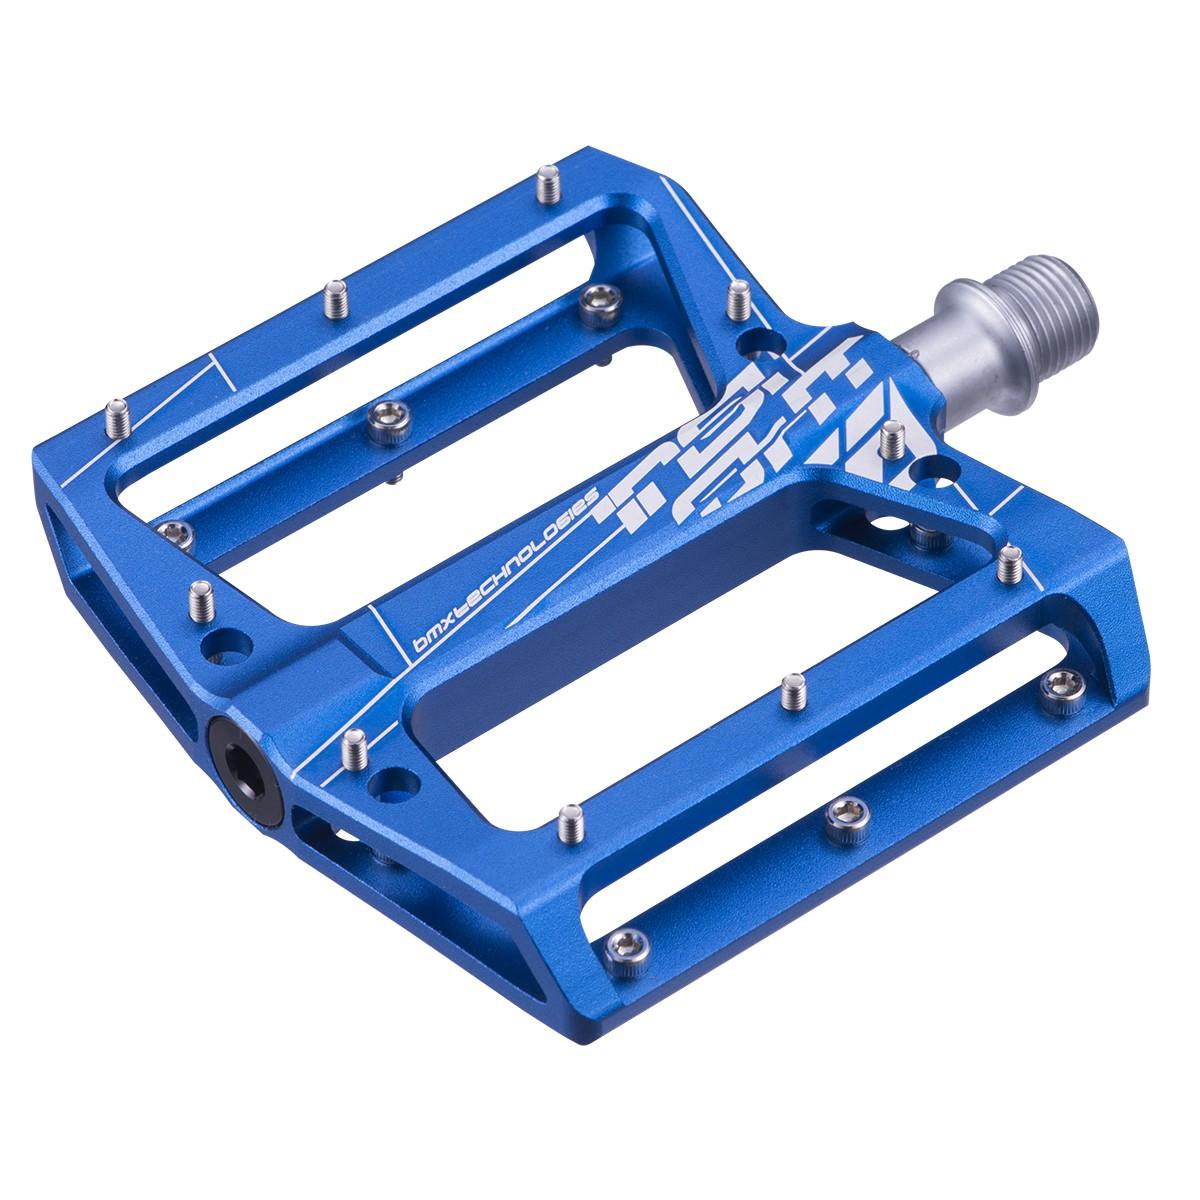 insight-platform-pedals-pro-916